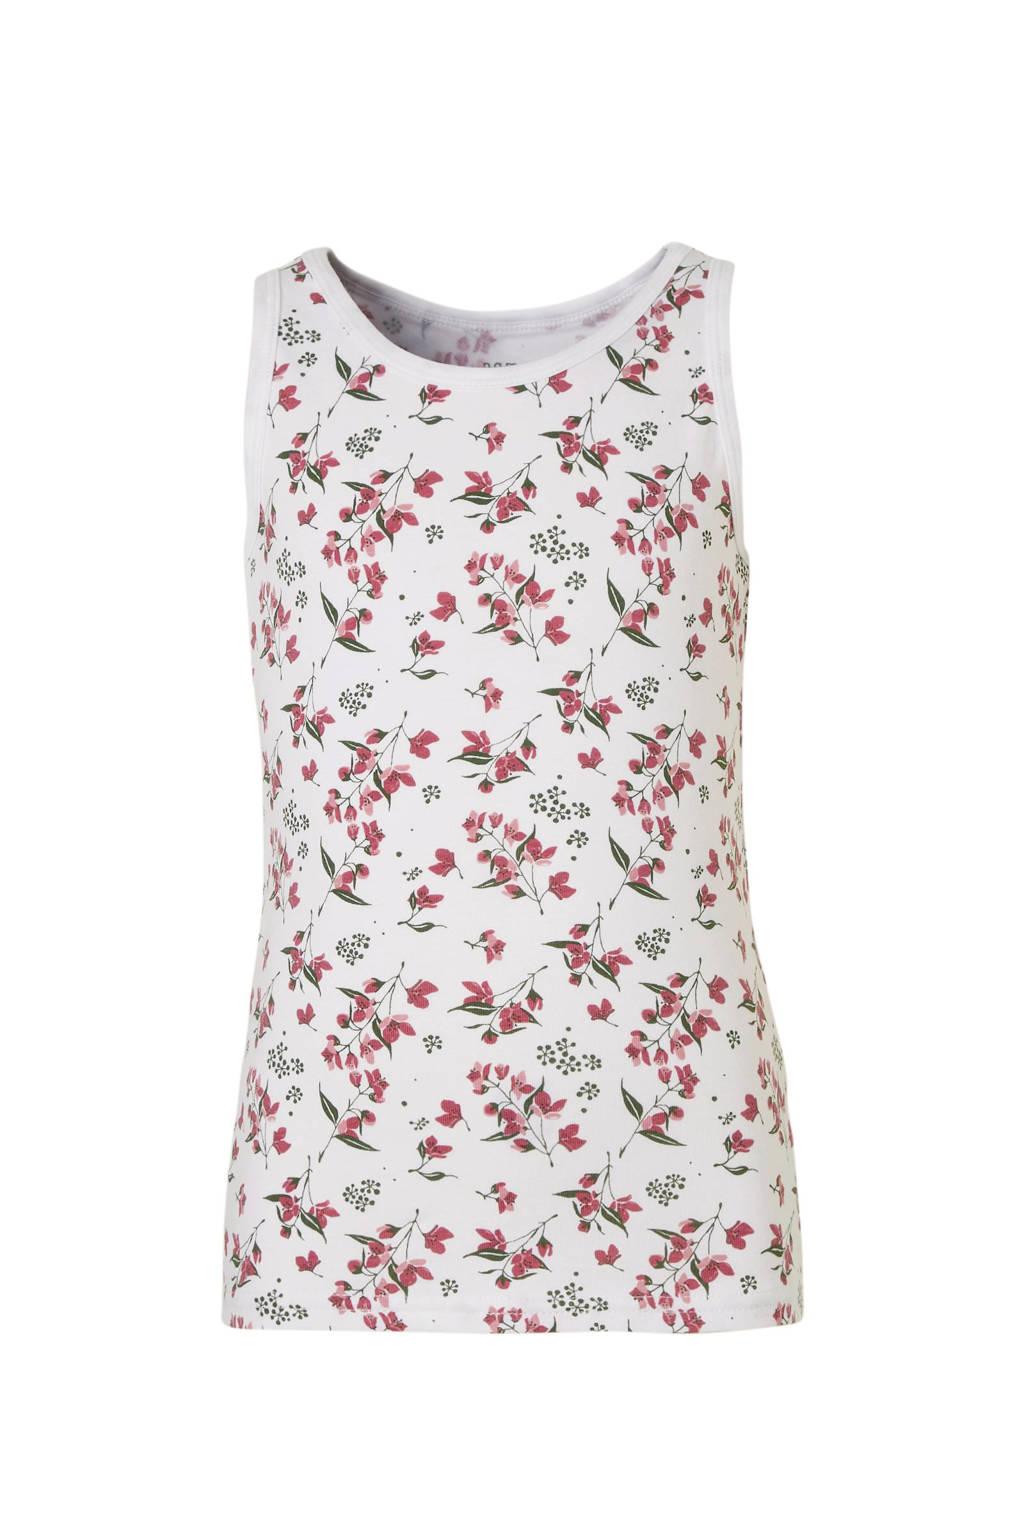 NAME IT MINI hemd - set van 2, Roez/ wit